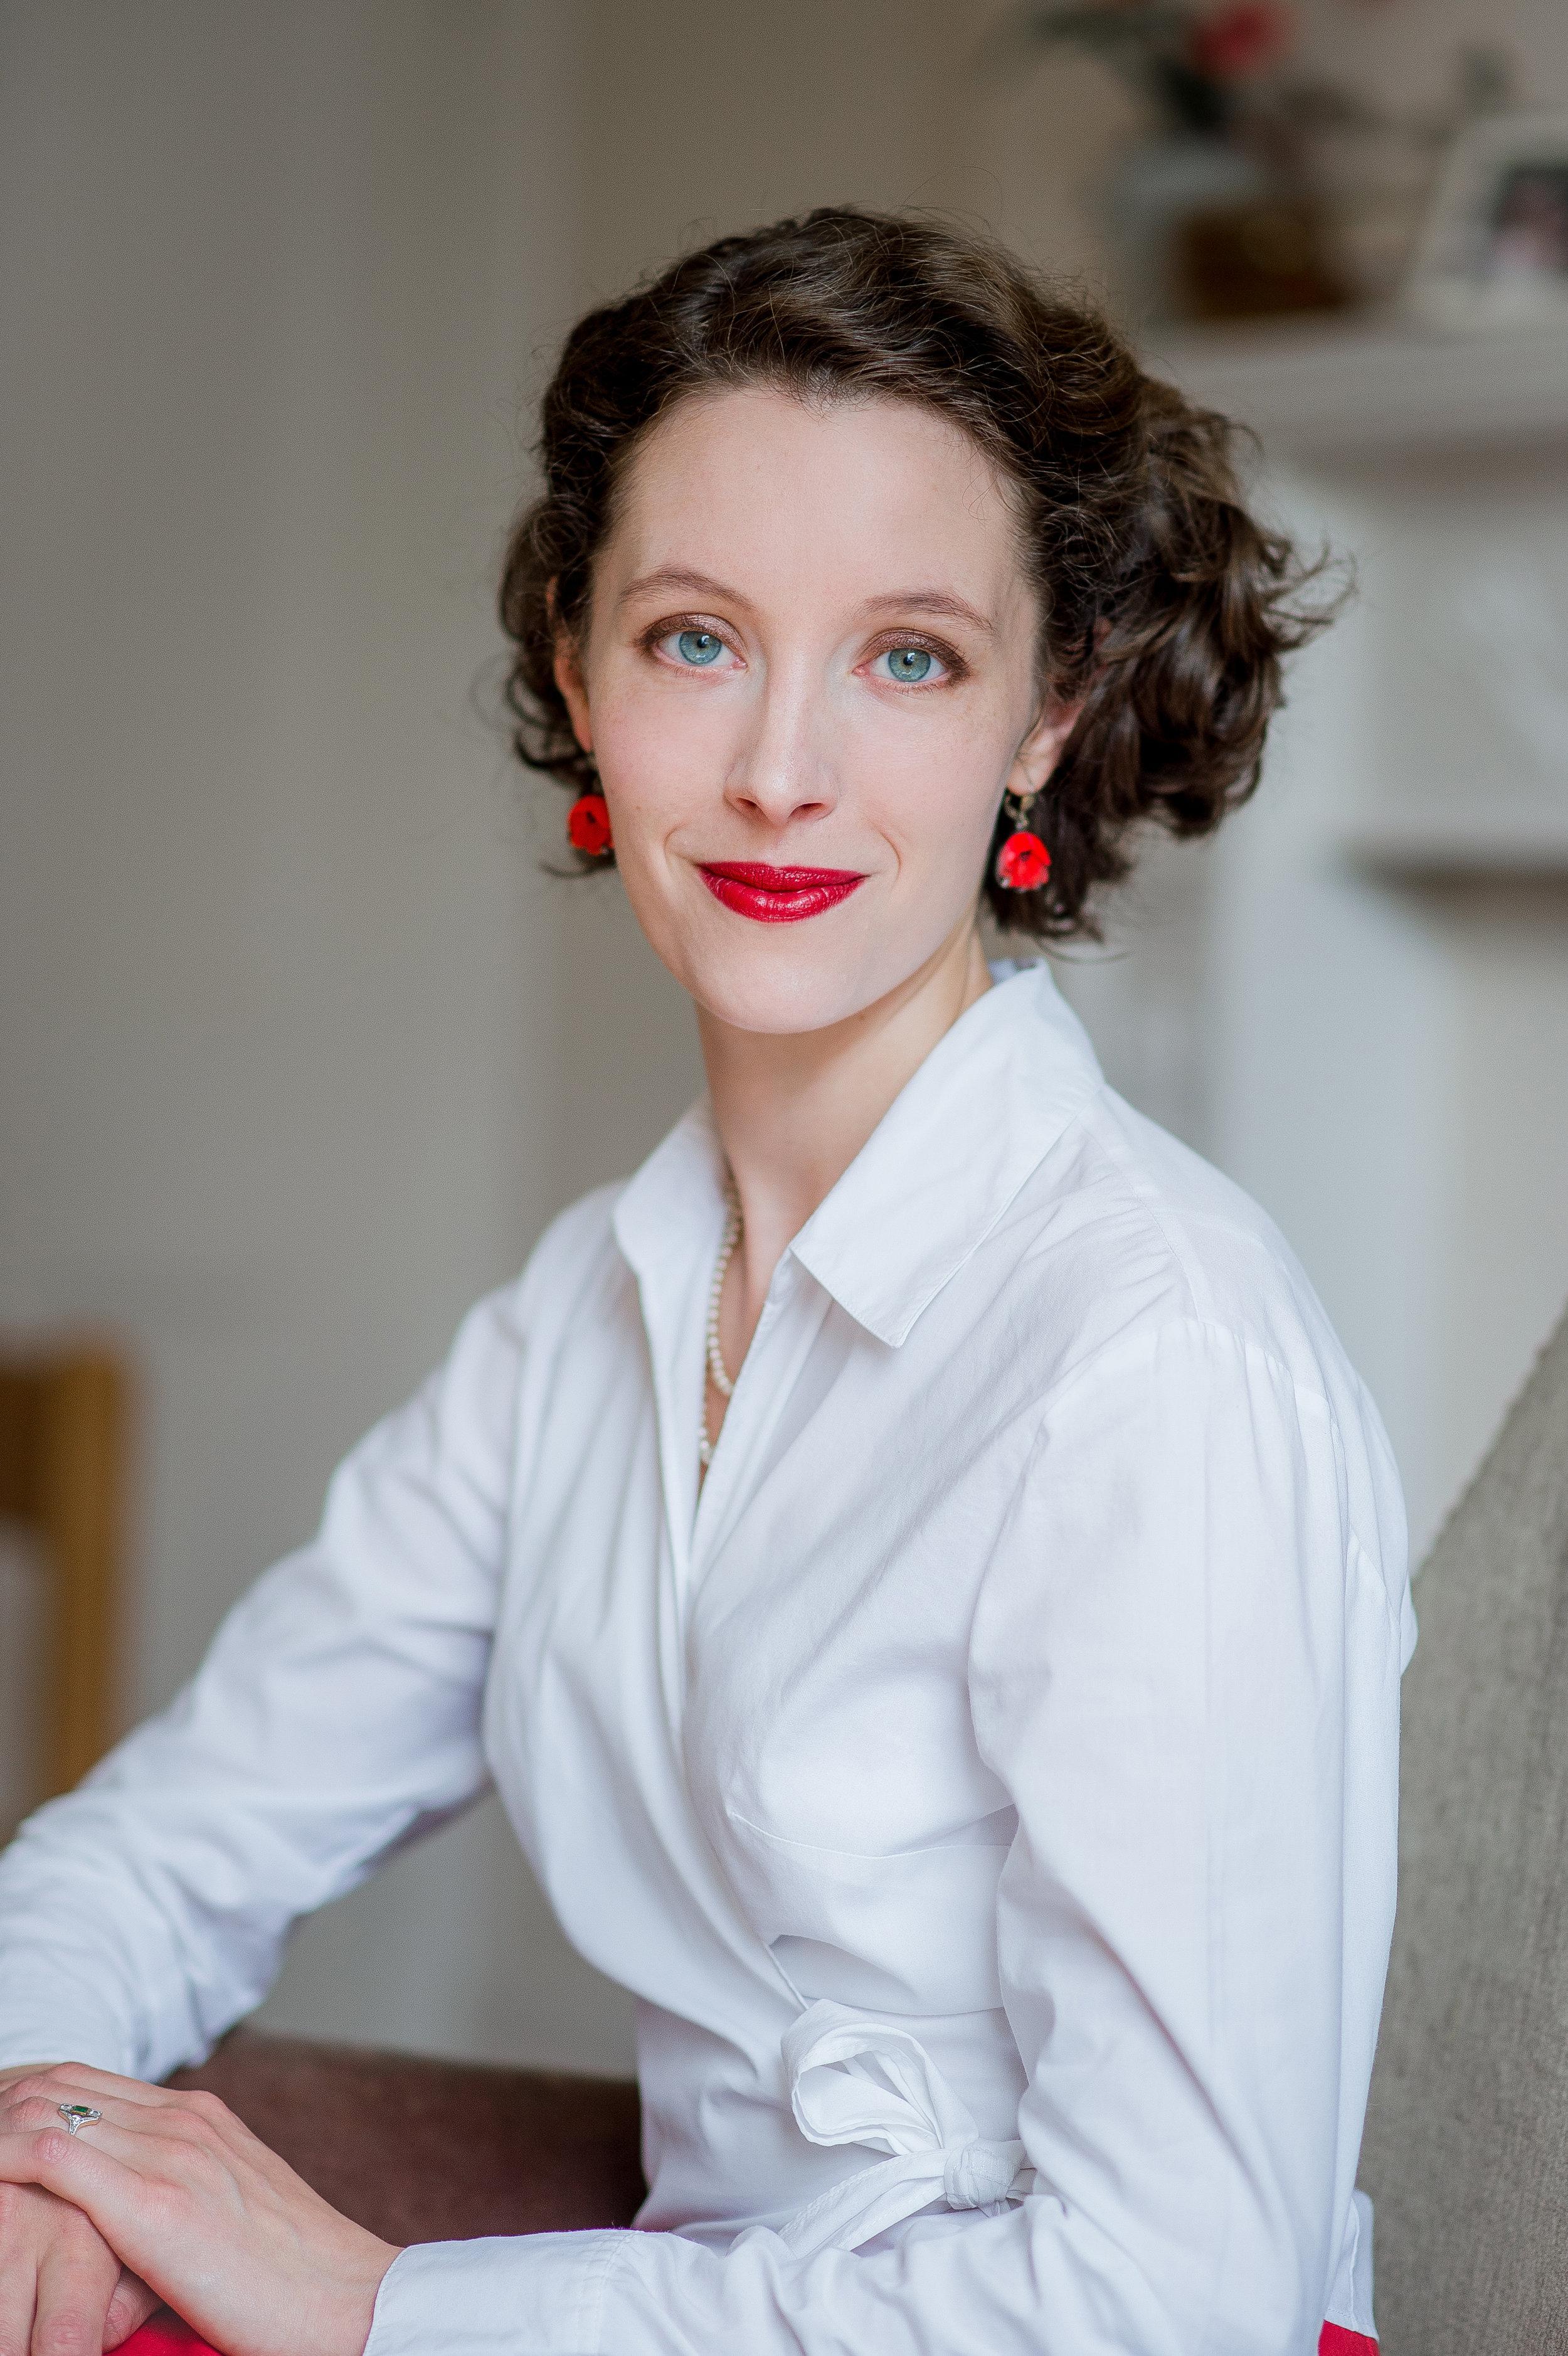 Dr. Chloe Reddaway